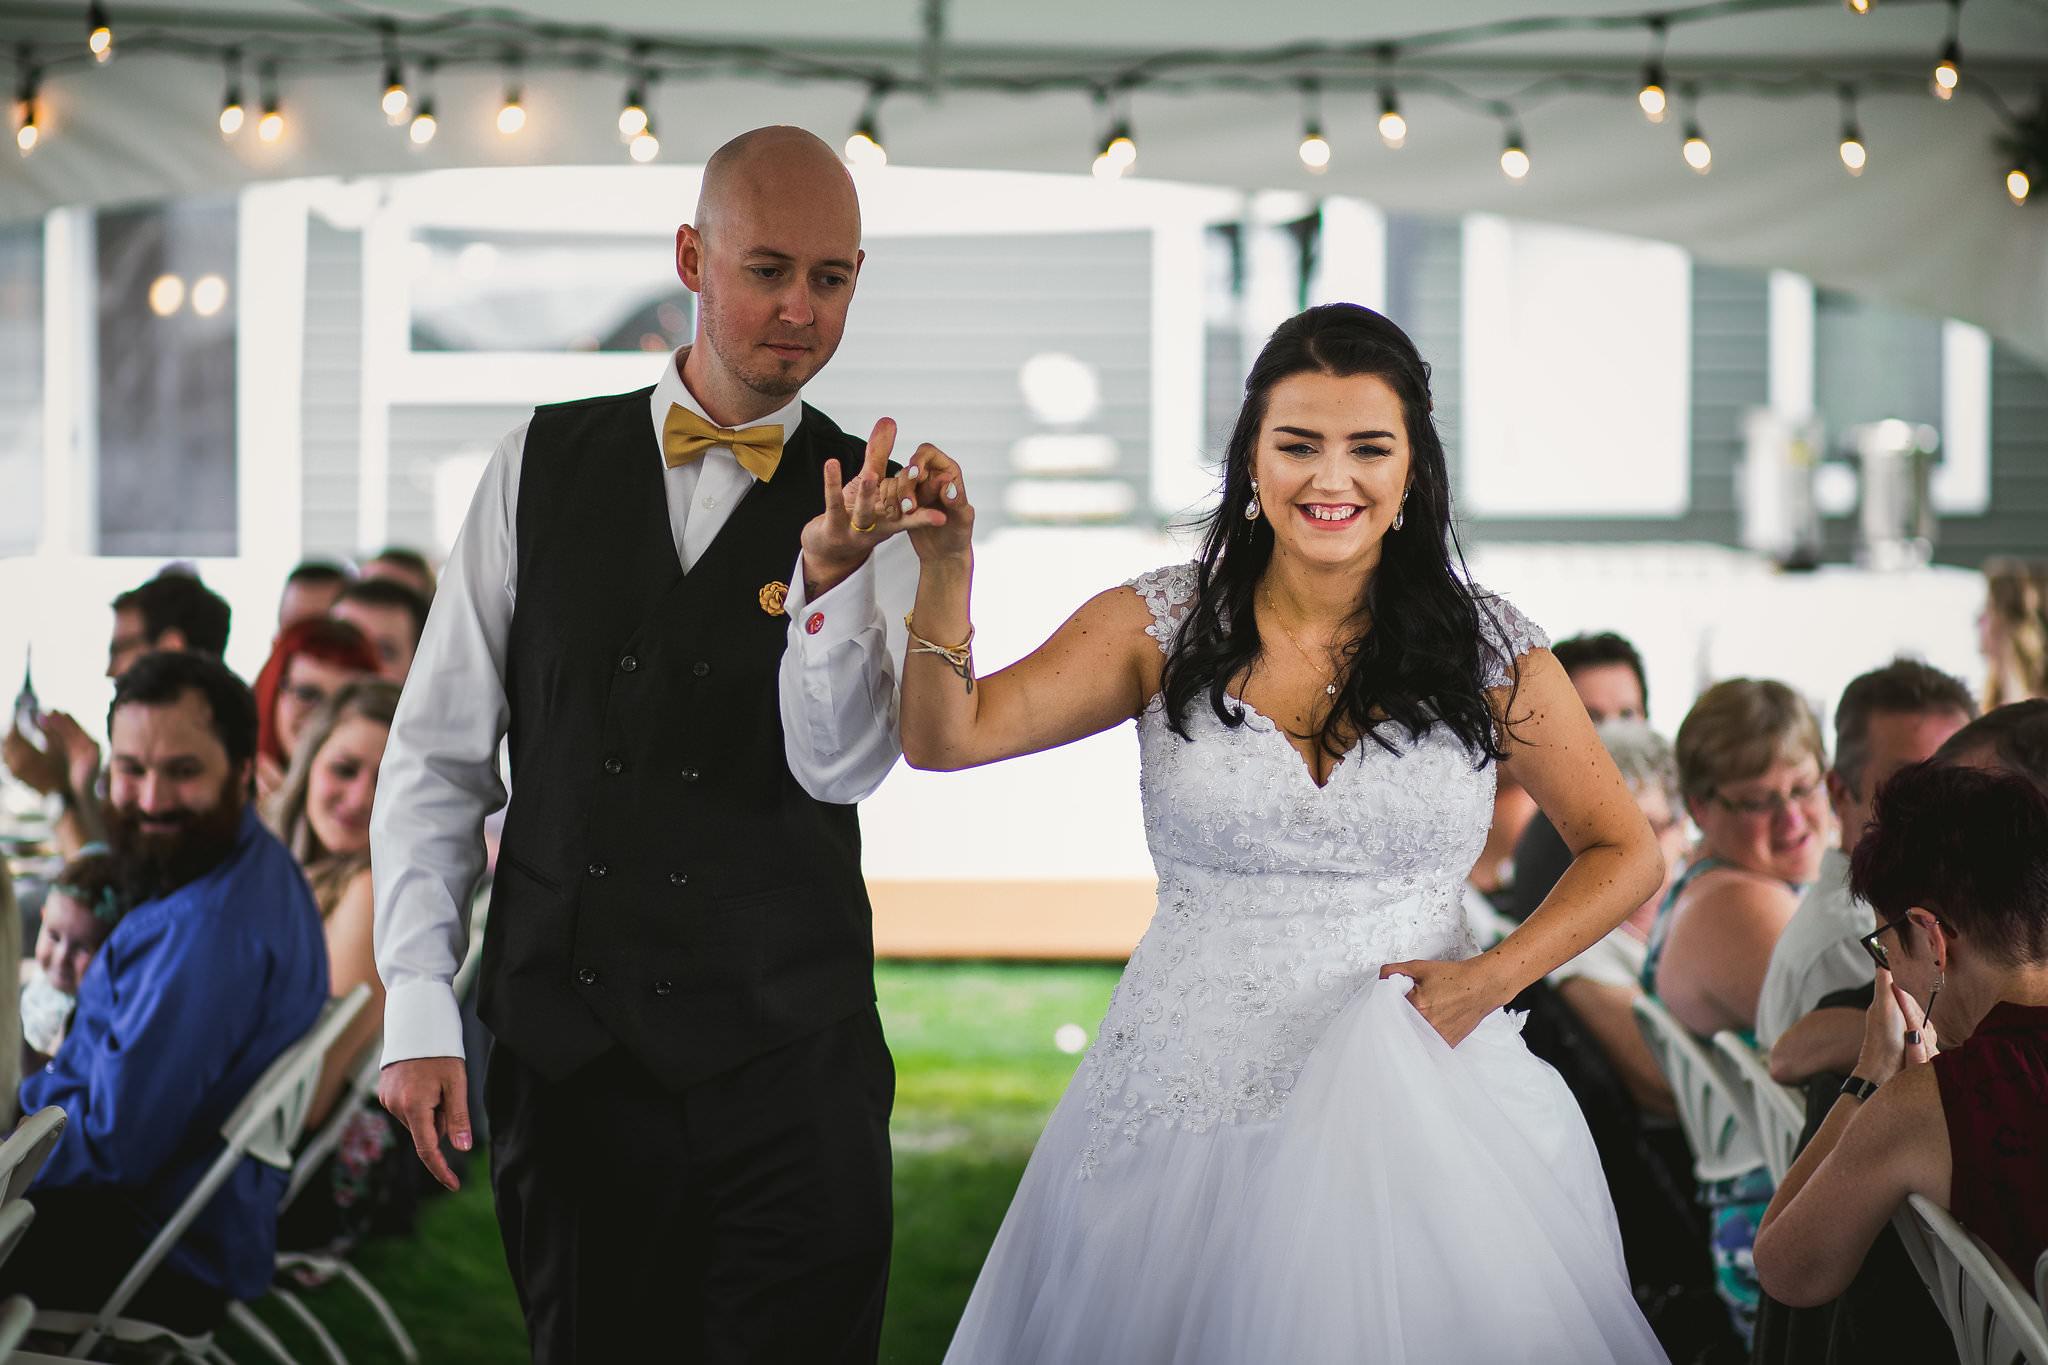 Kristen Adam Kindred Loft Whitby Wedding Photos 372 - Durham Wedding Photographer: Kindred Loft Wedding Photos